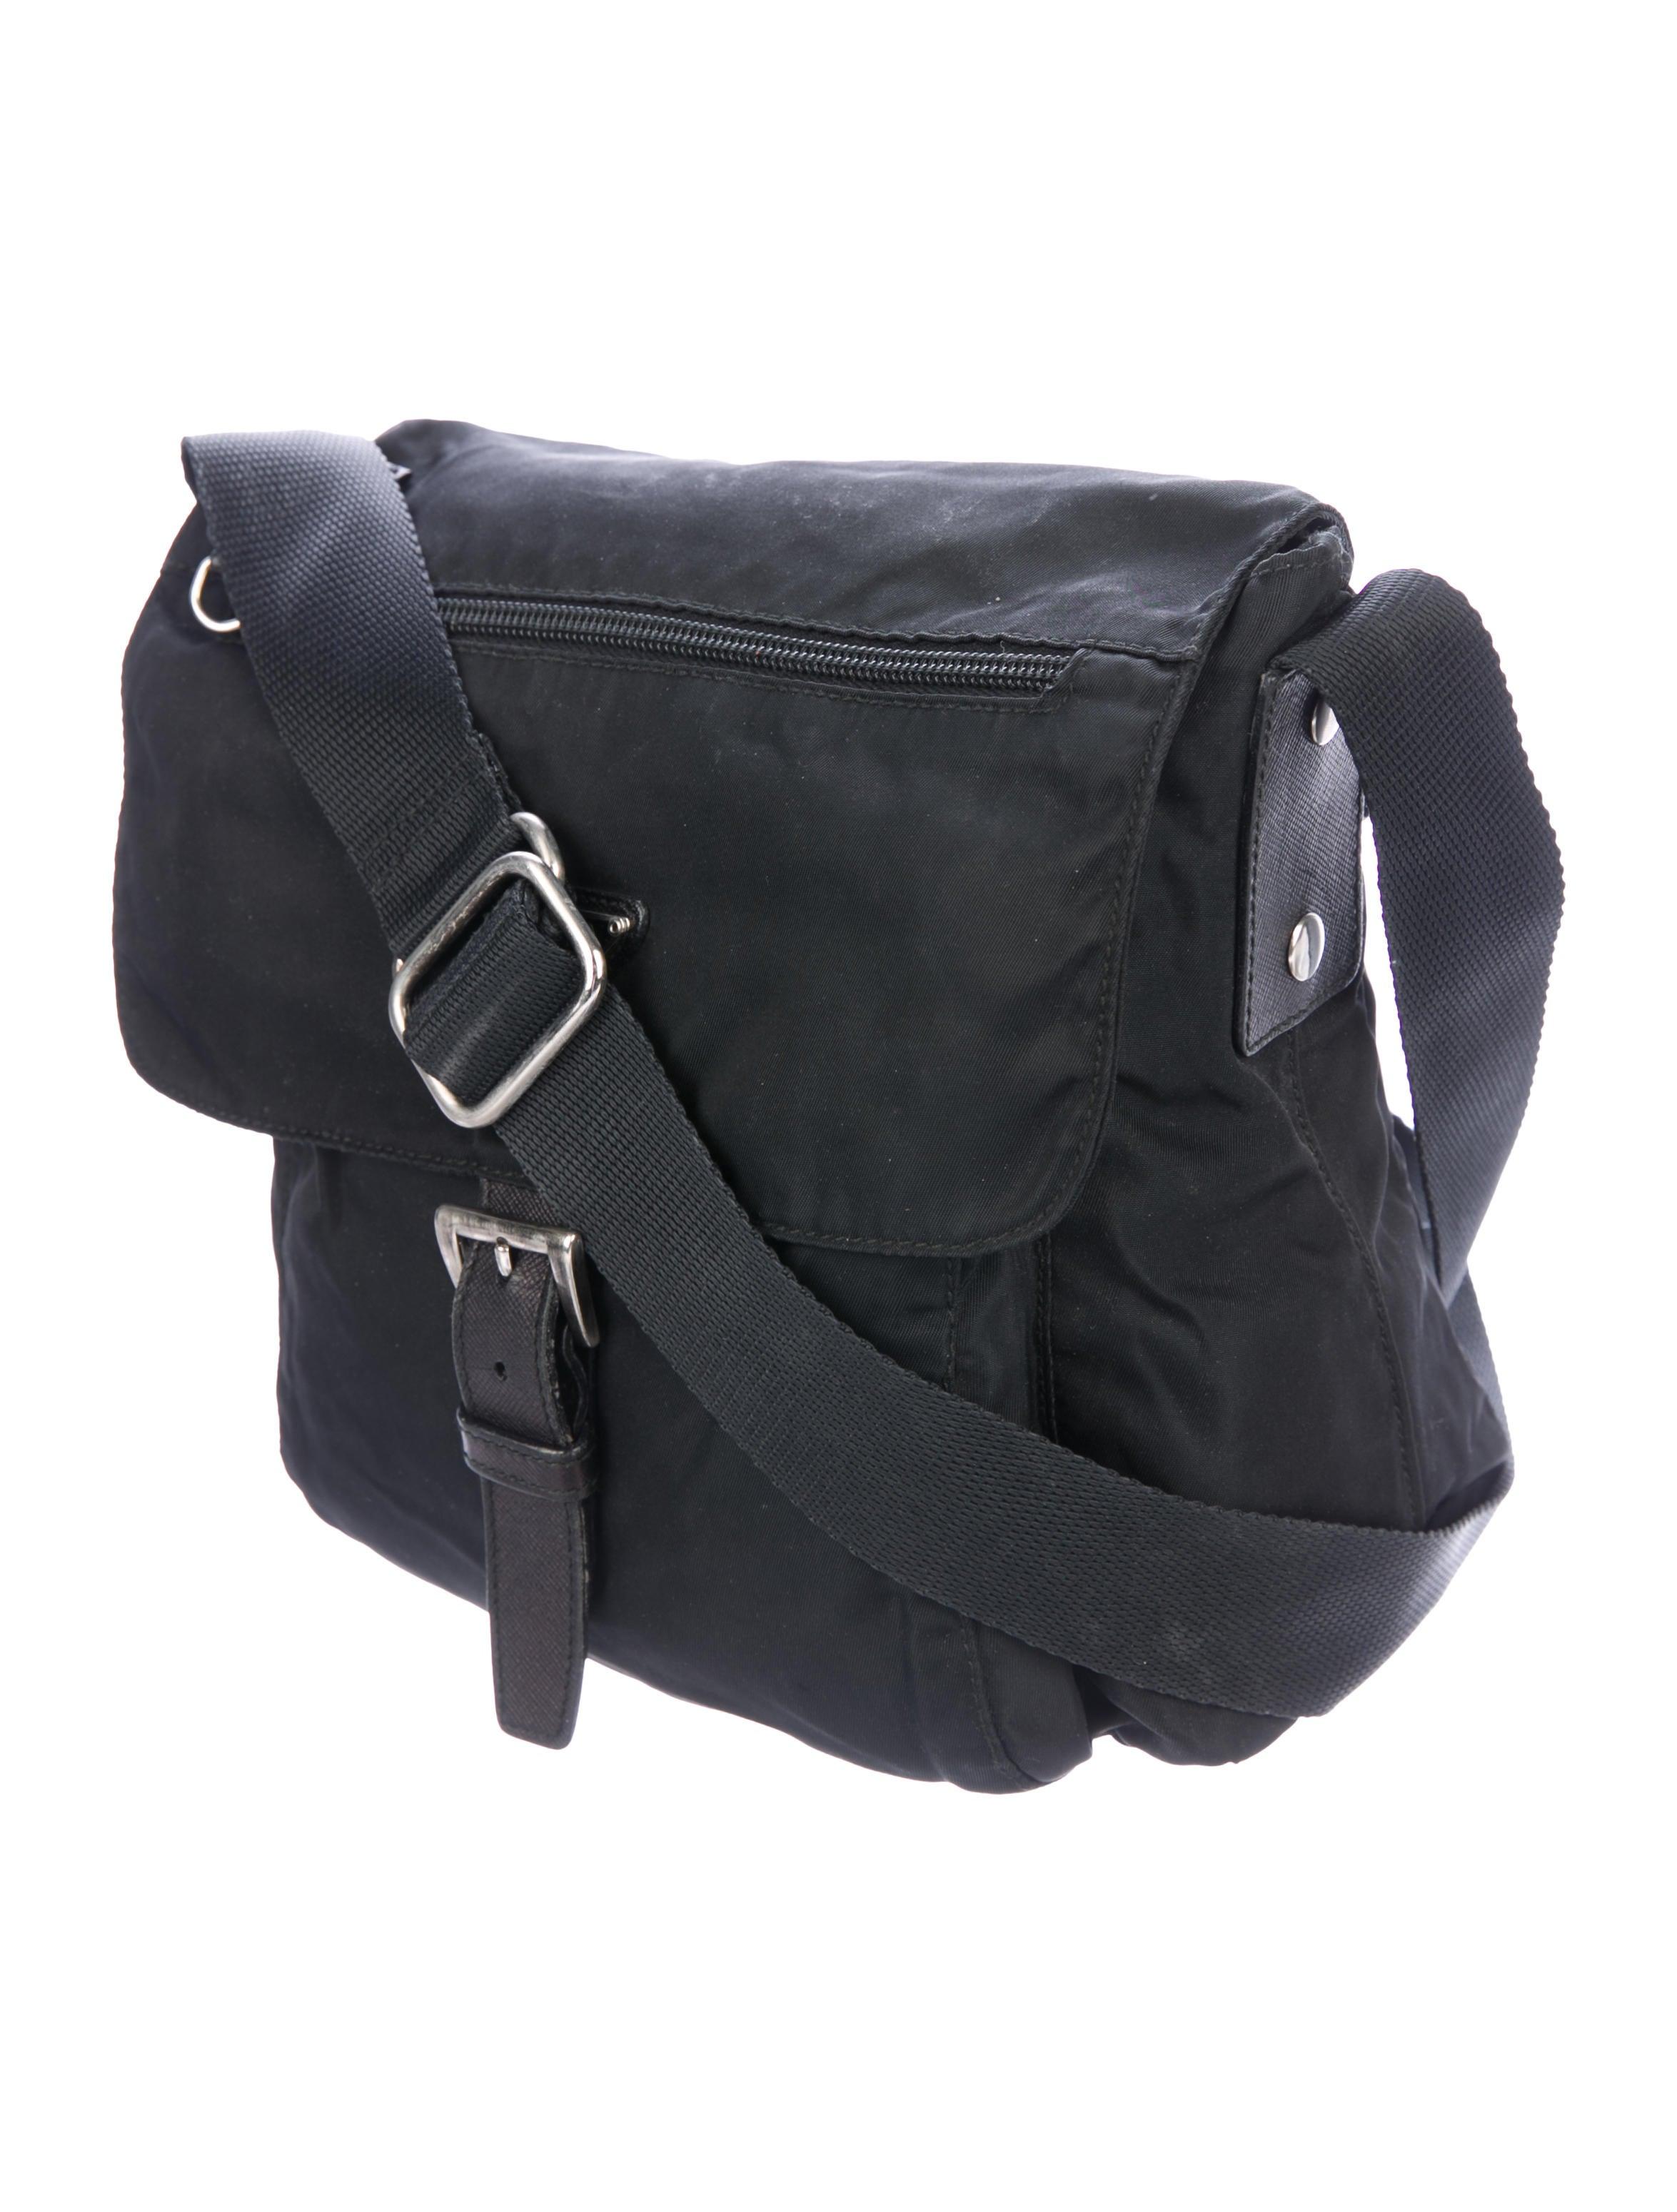 ... Ralph Lauren Equestrian Vachetta Saddle Bag quality design f4b3e 3a835   Saffiano-Trimmed Vela Crossbody Bag los angeles 5d83b 05290 ... c5a5a24acb